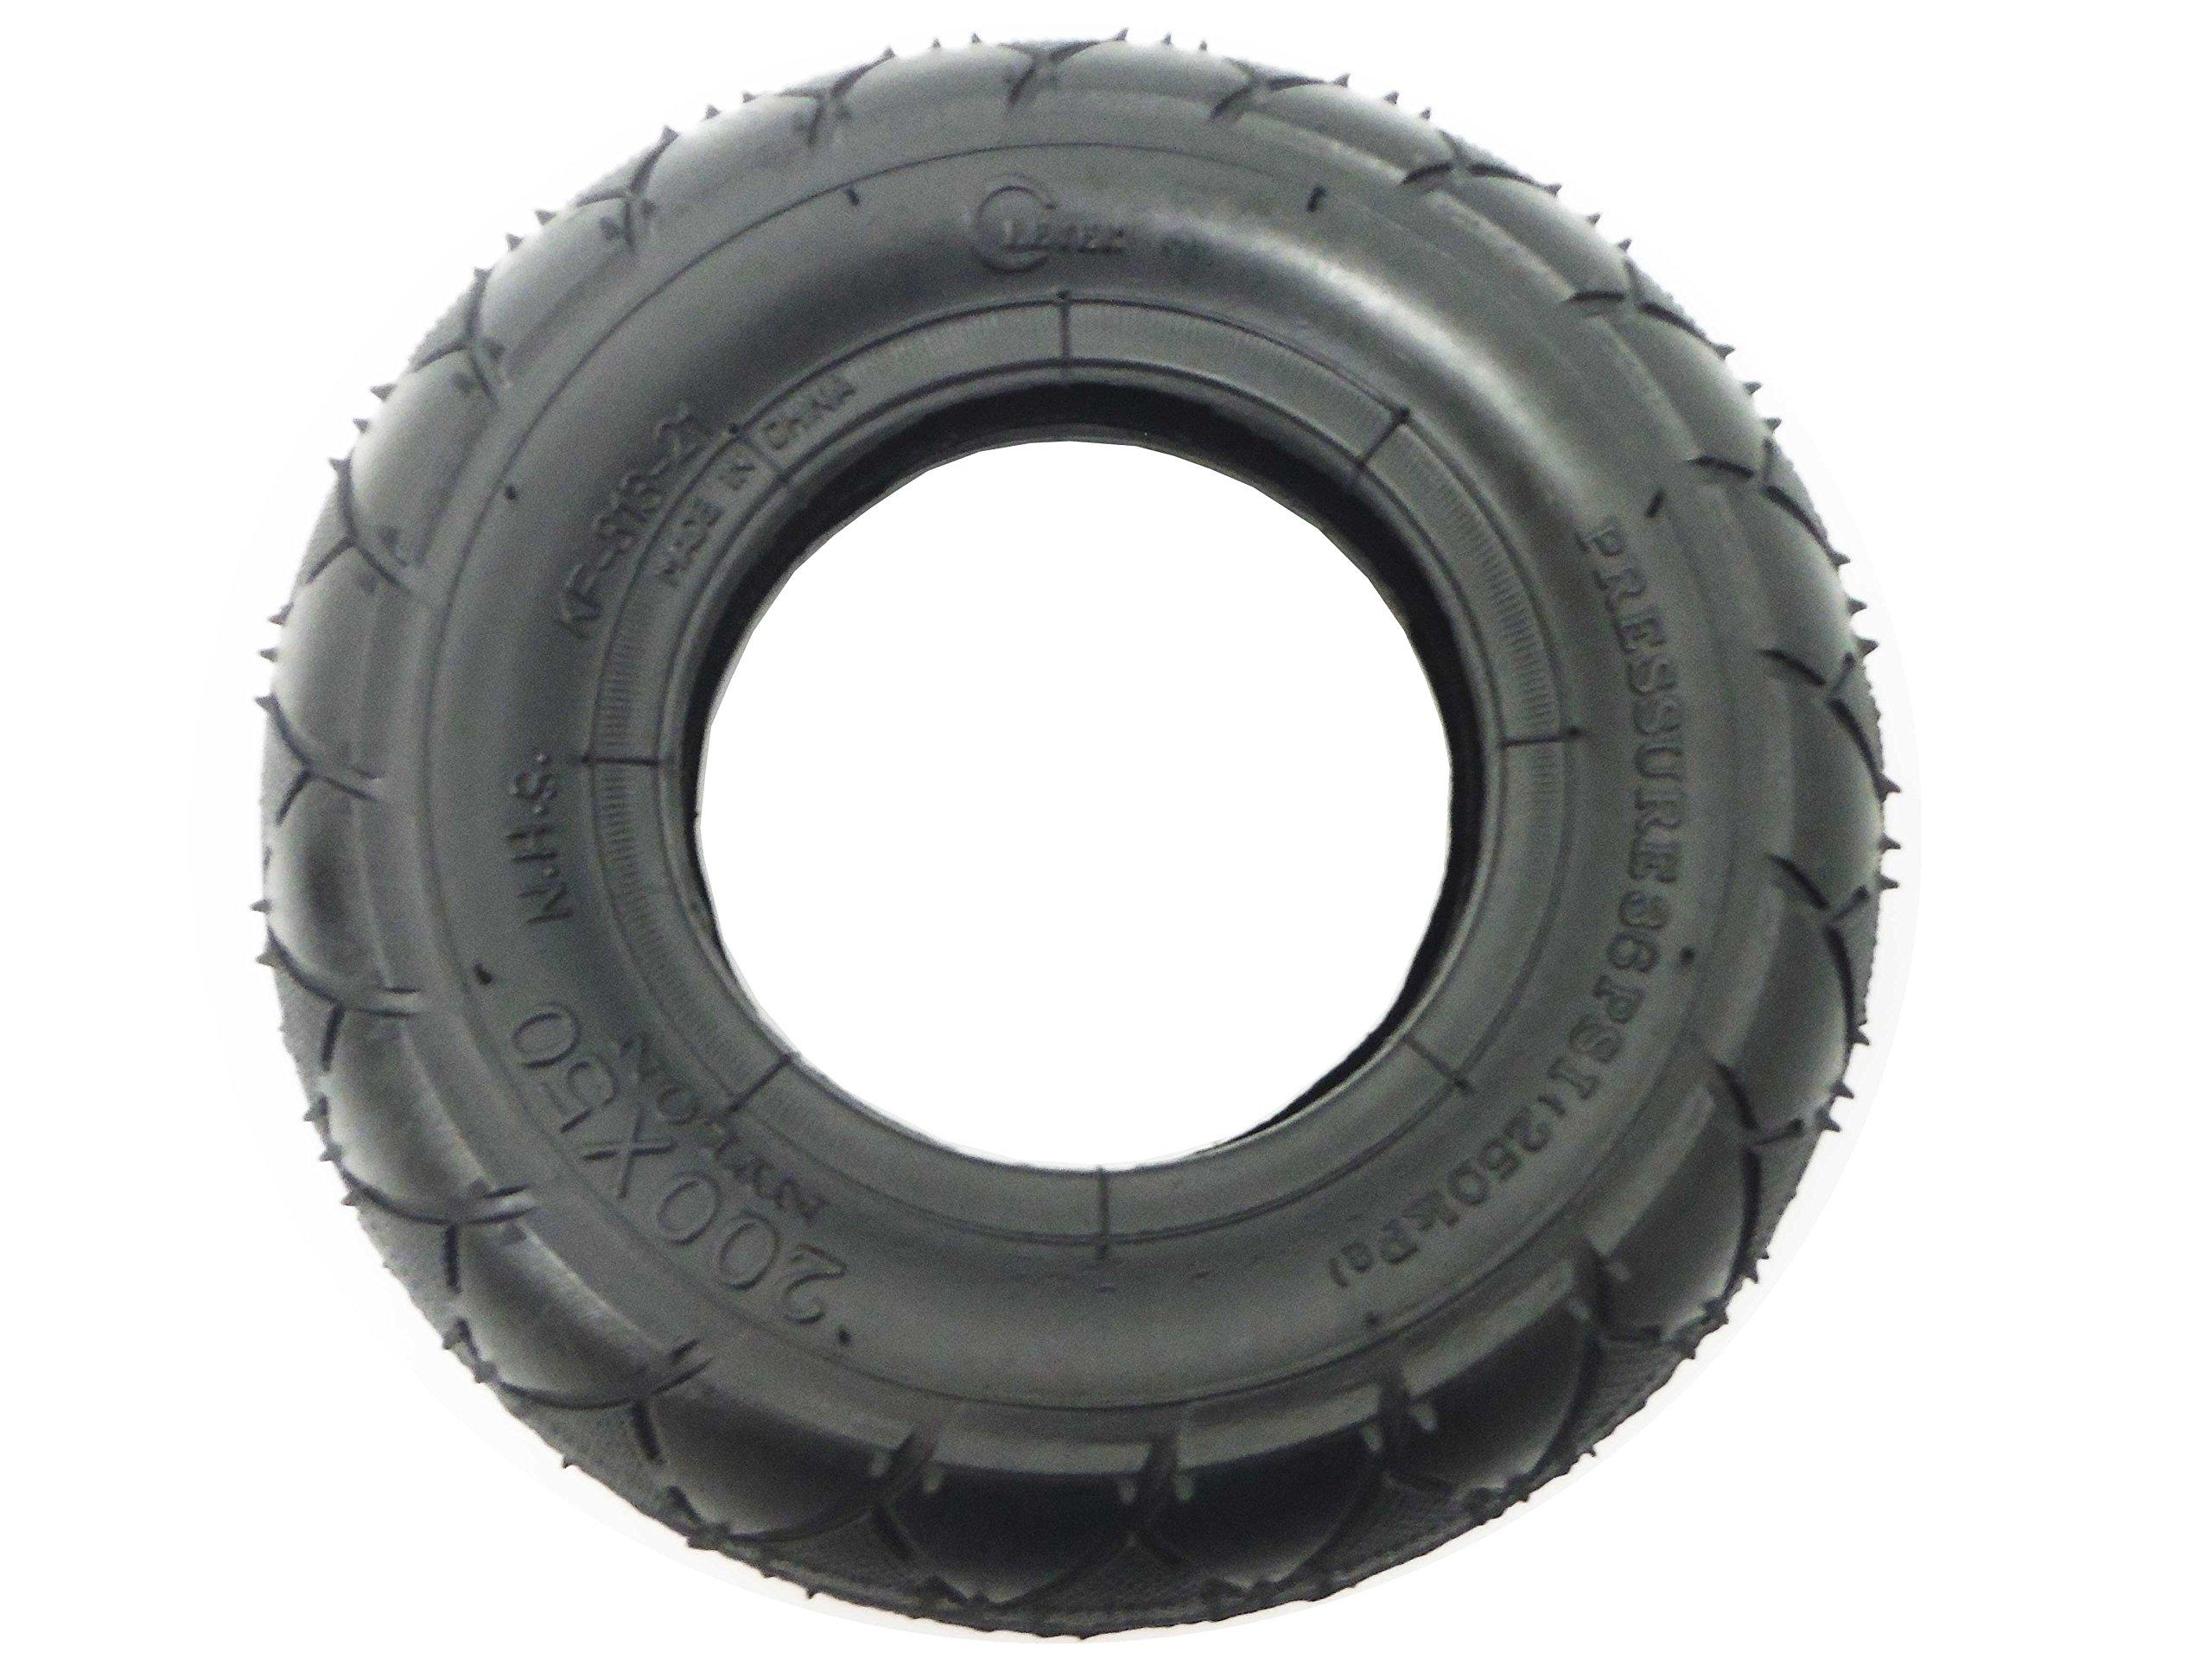 Tire Only (Razor Crazy Cart and Crazy Cart DLX)